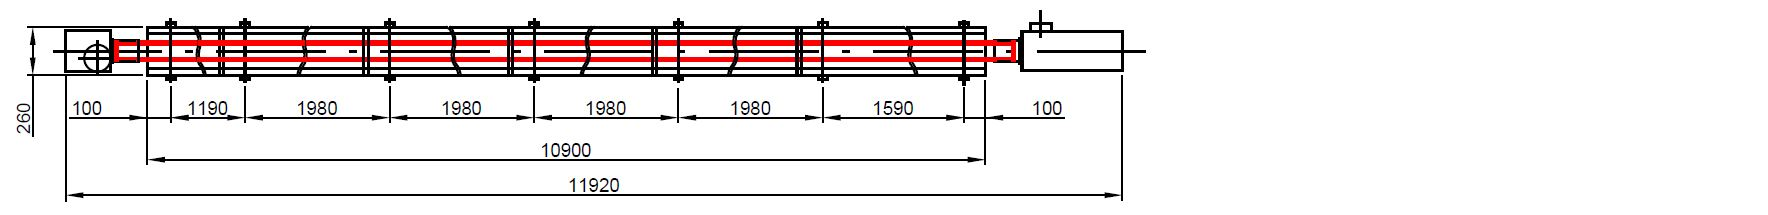 KM-22,5-1-11m